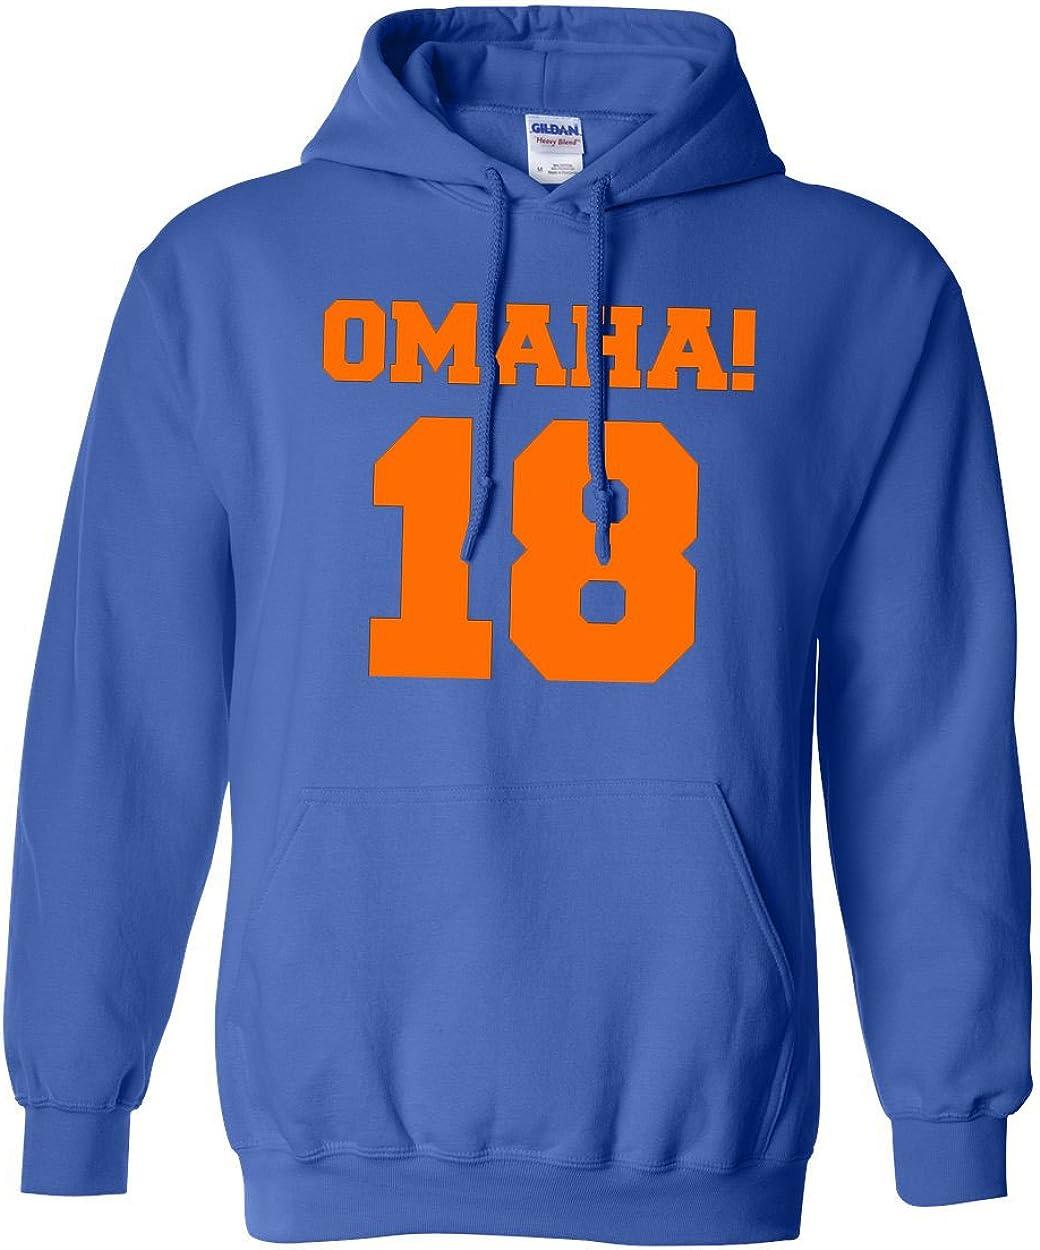 City Shirts Omaha Indefinitely Manning Super sale period limited Denver Sweatshirt Hoodie